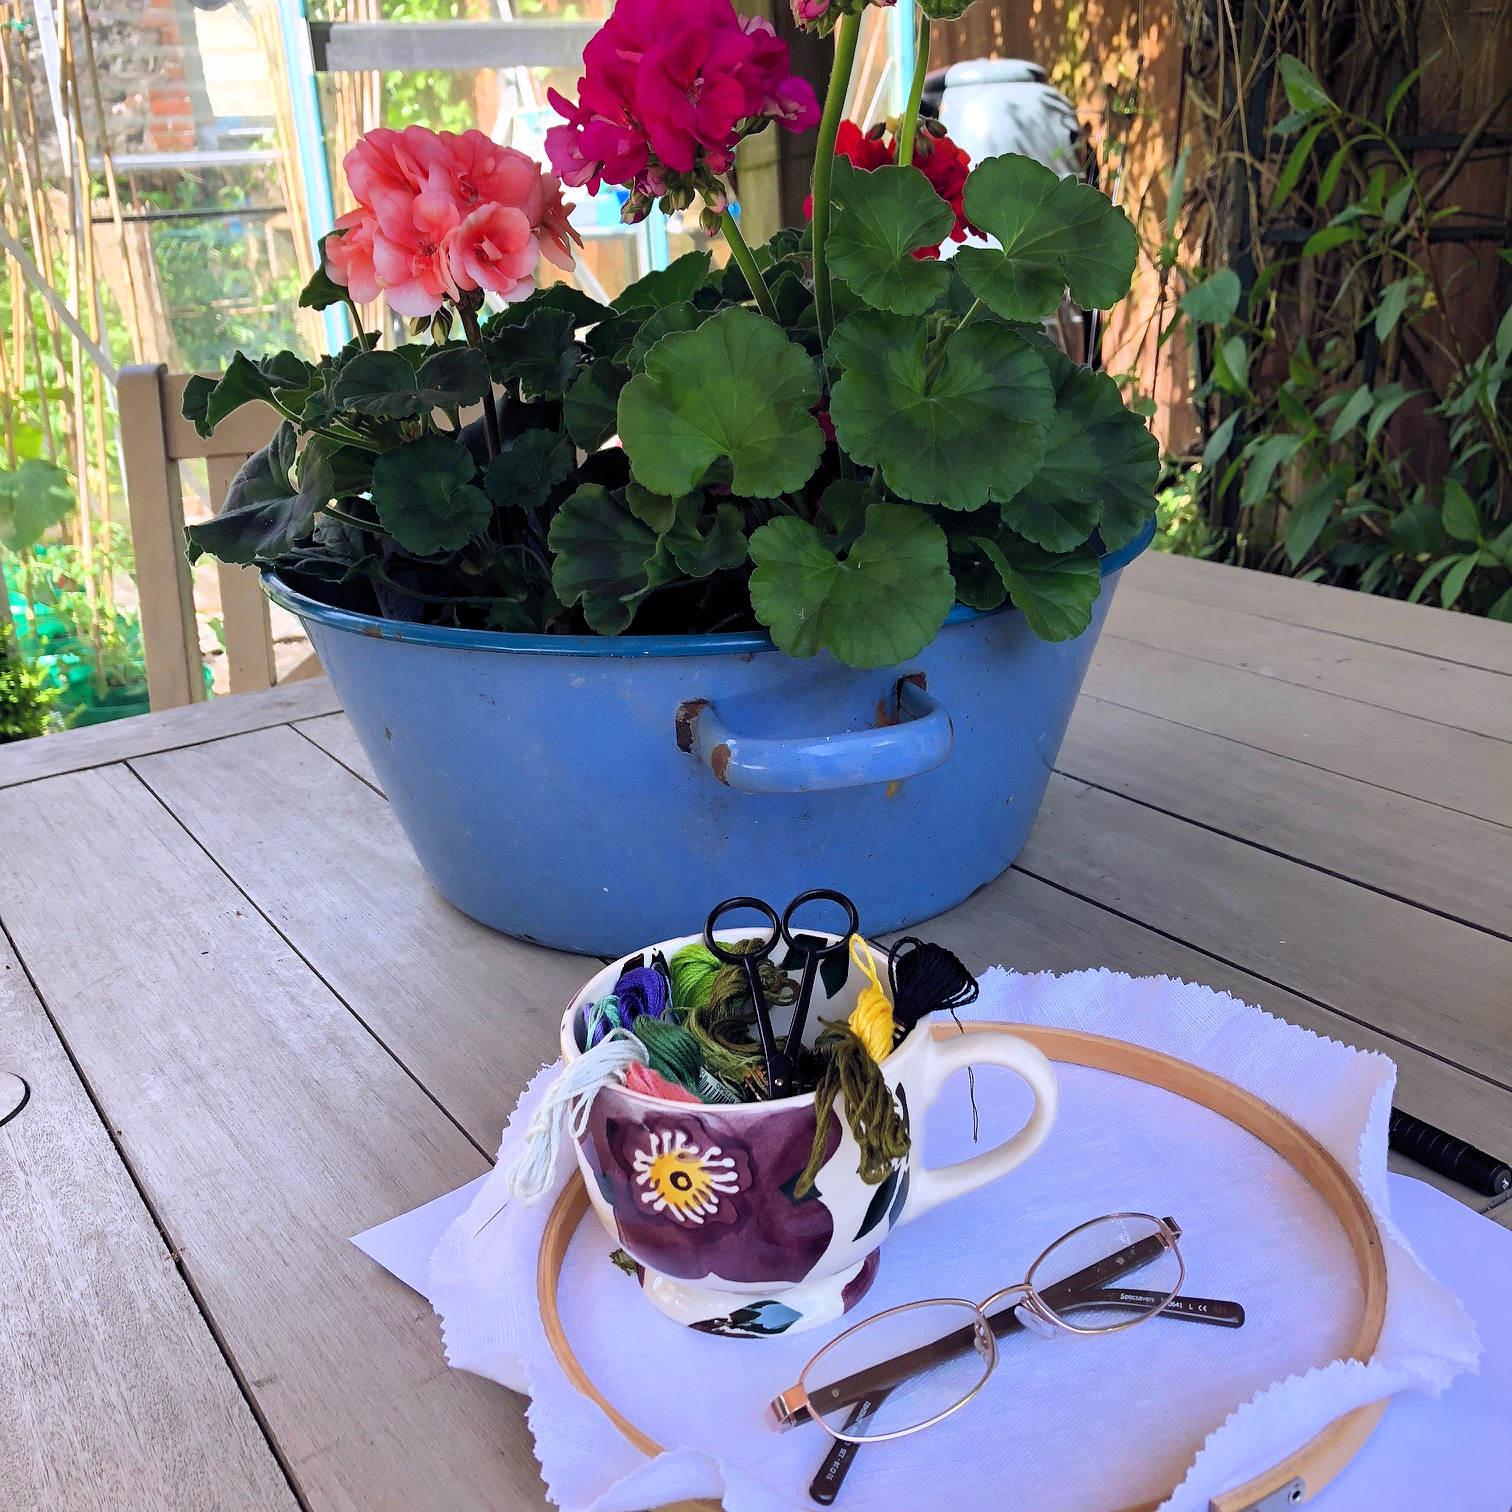 Garden Sewing